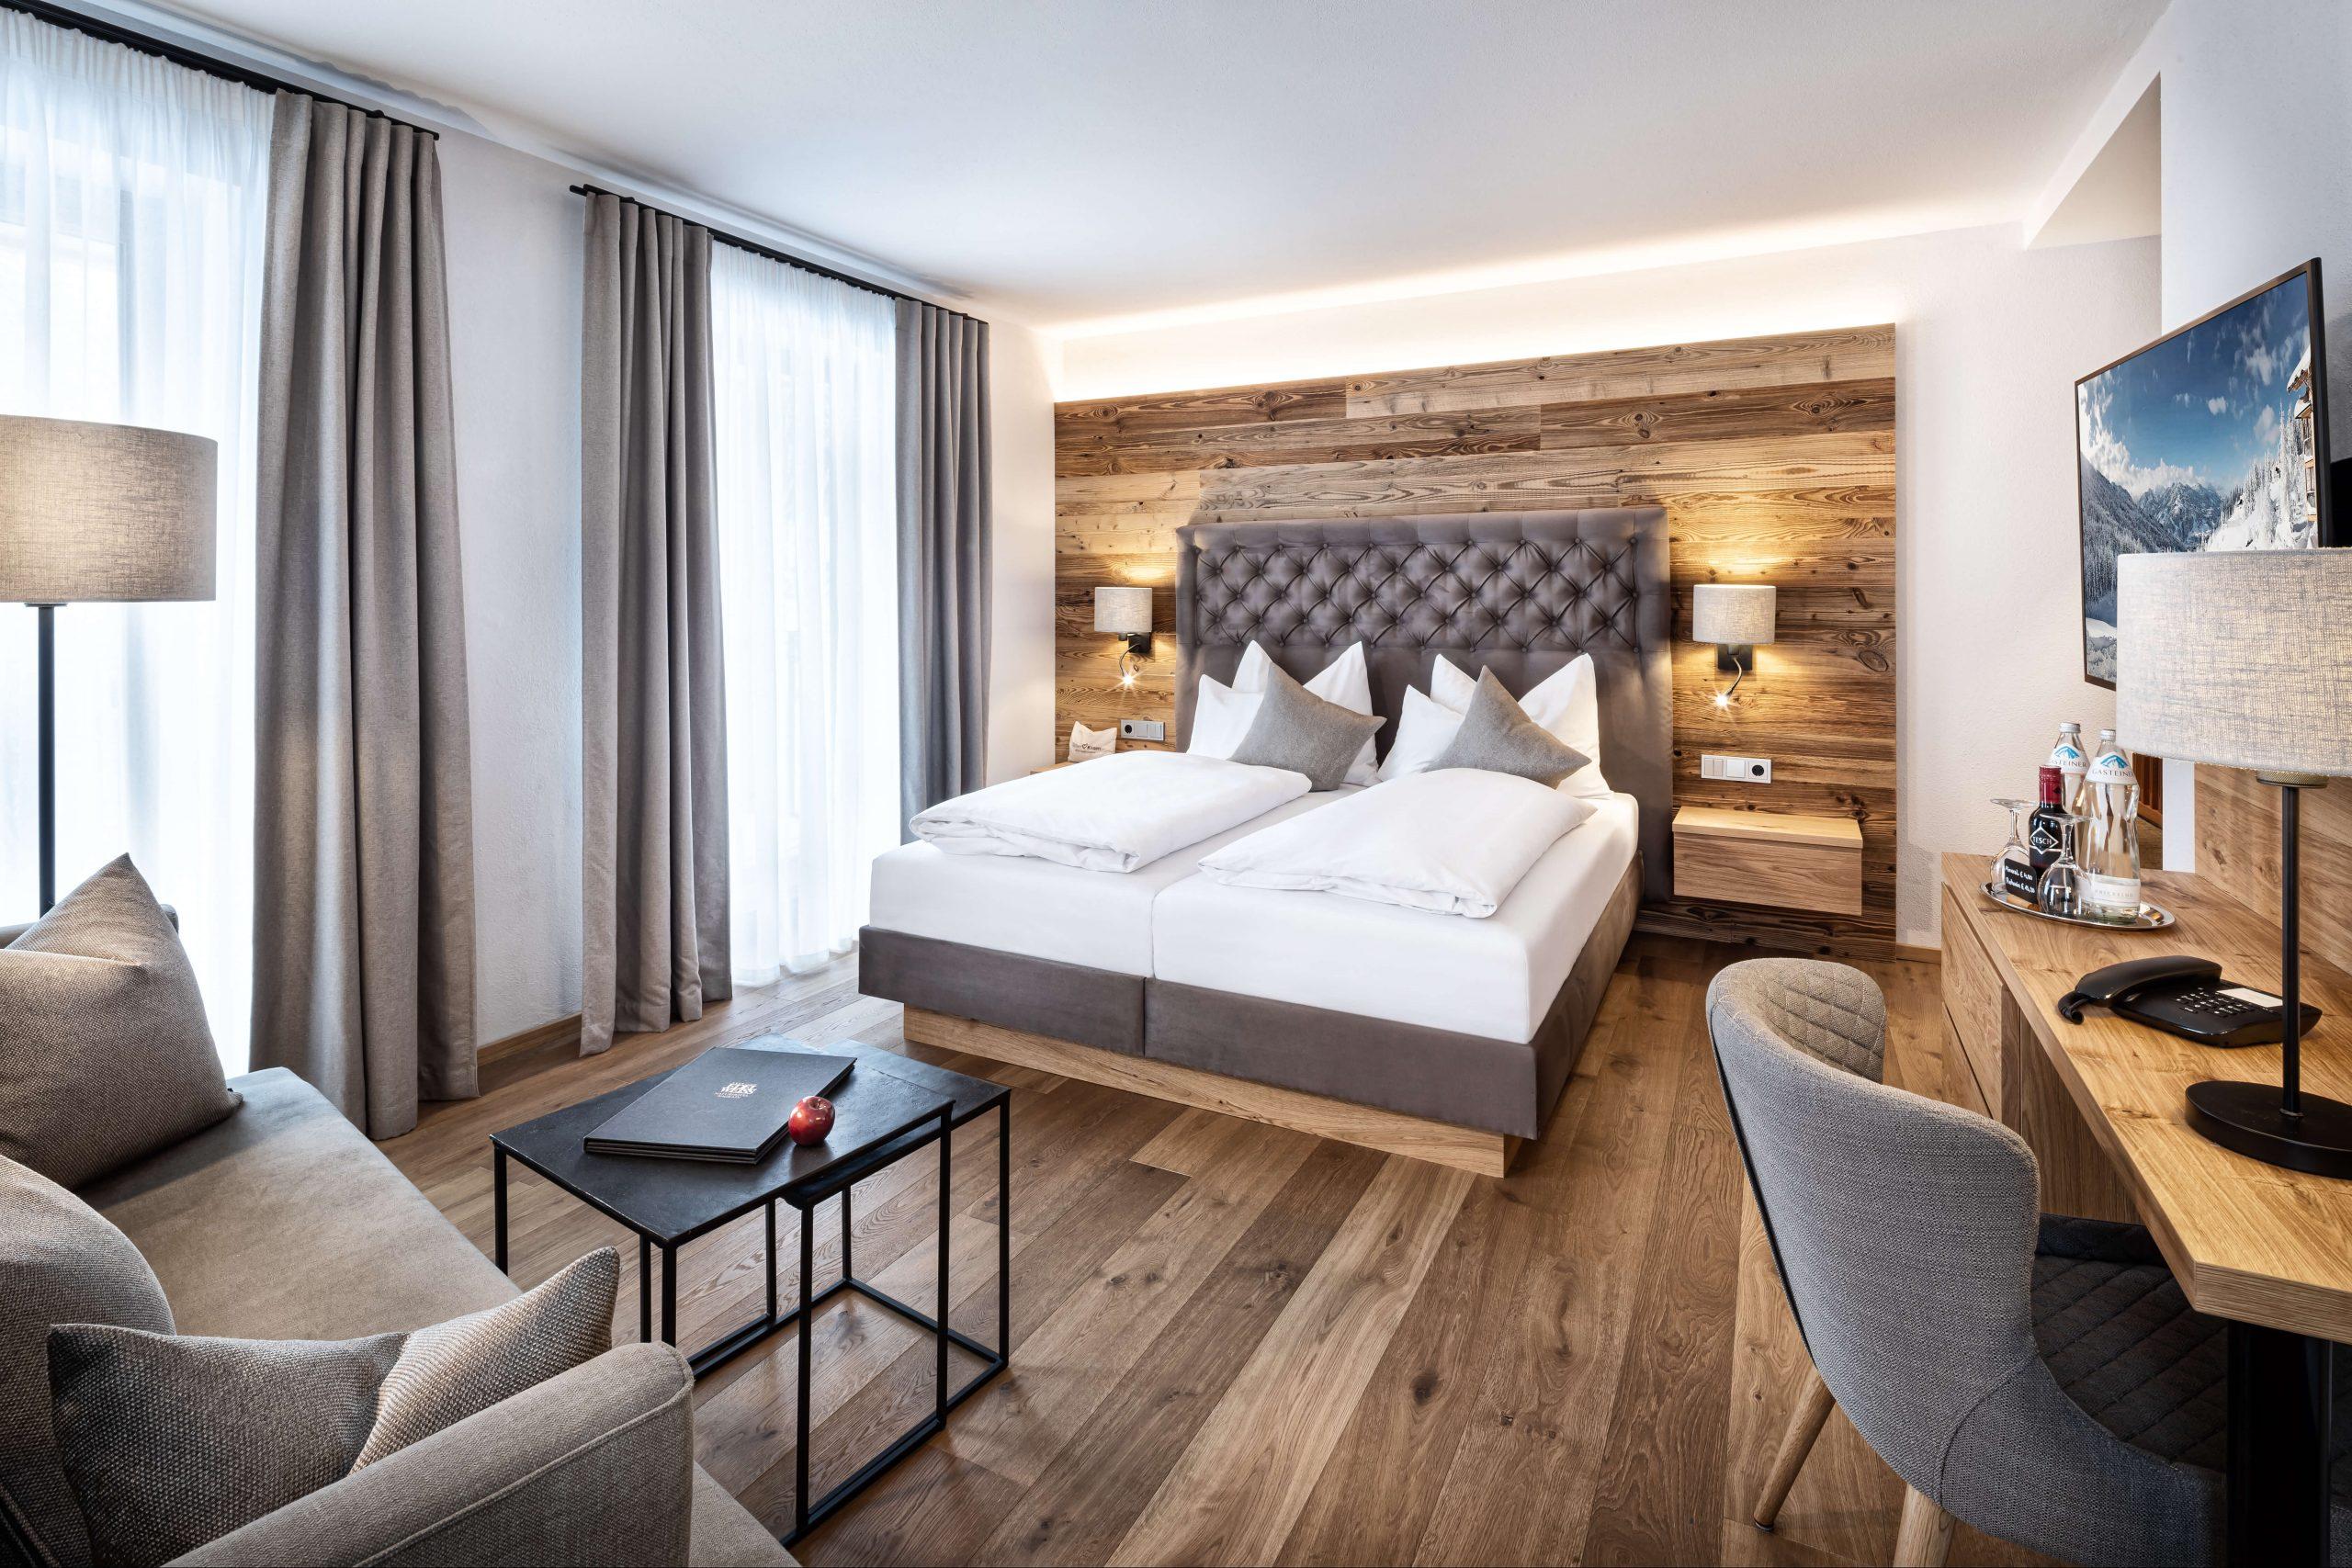 Doppelzimmer Alpenzauber - Naturhotel Edelweiss Wagrain